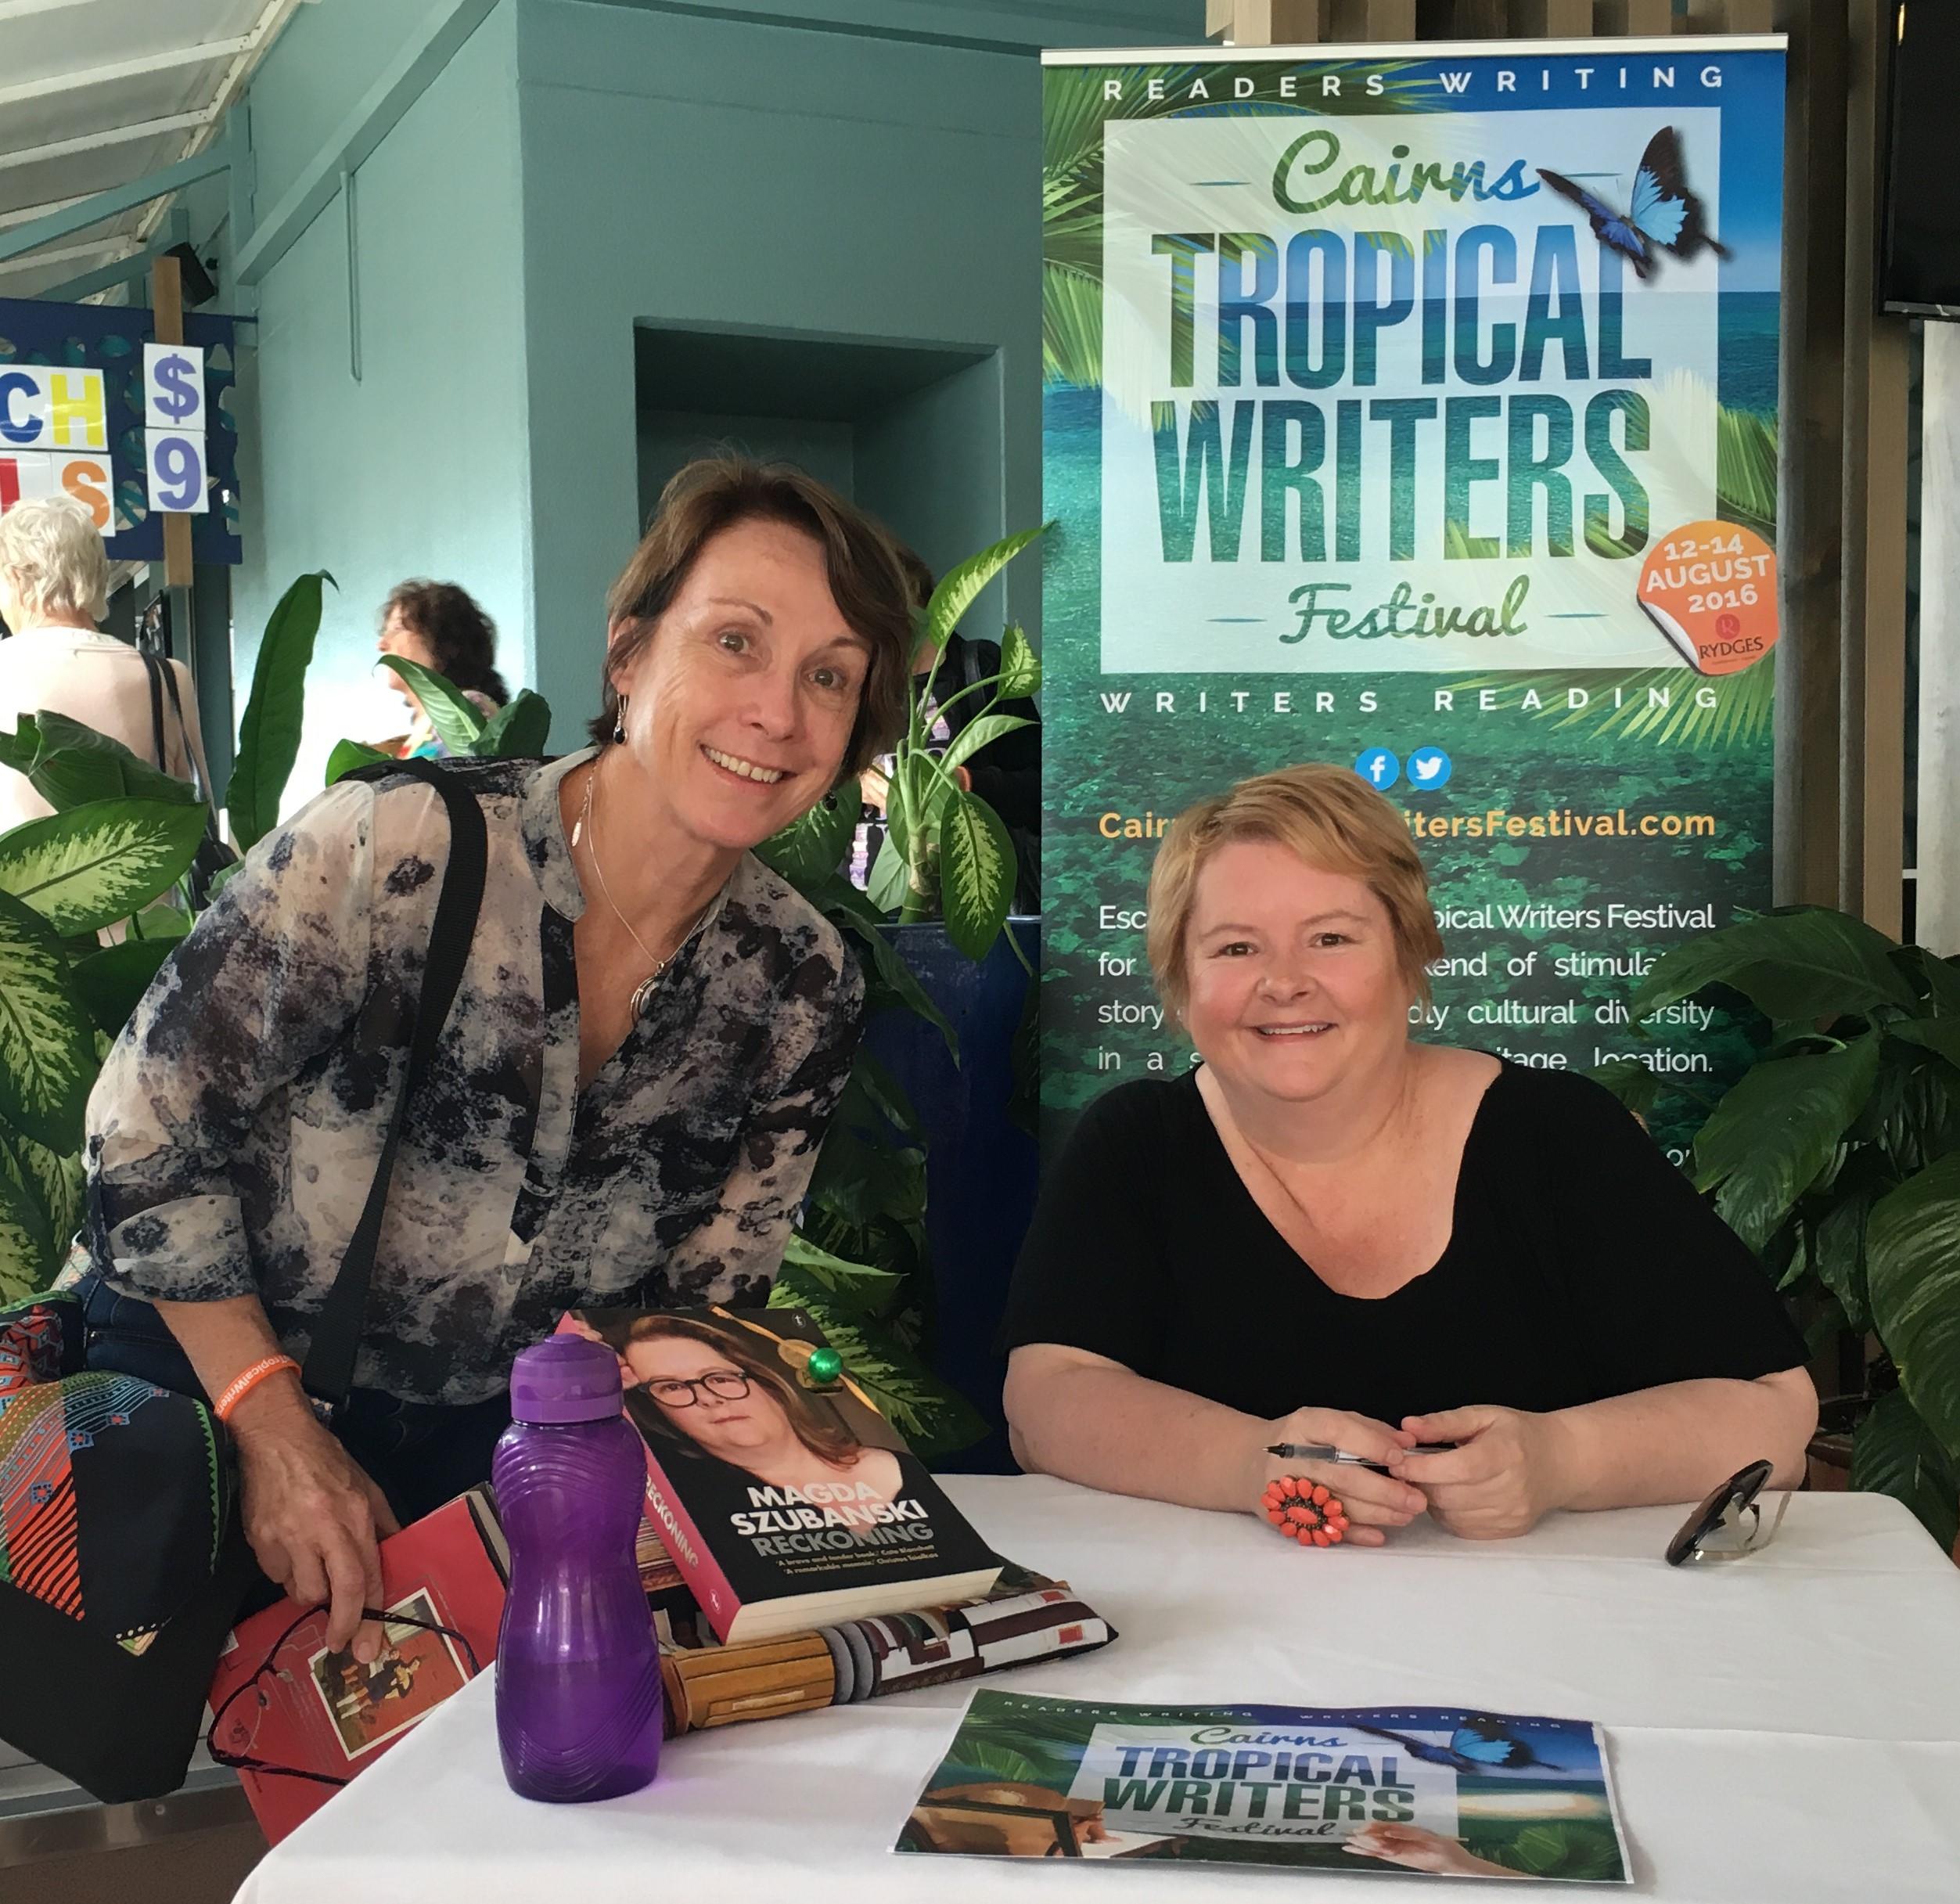 Angela and Magda Szubanski at the 2016 Cairns Tropical Writers Festival